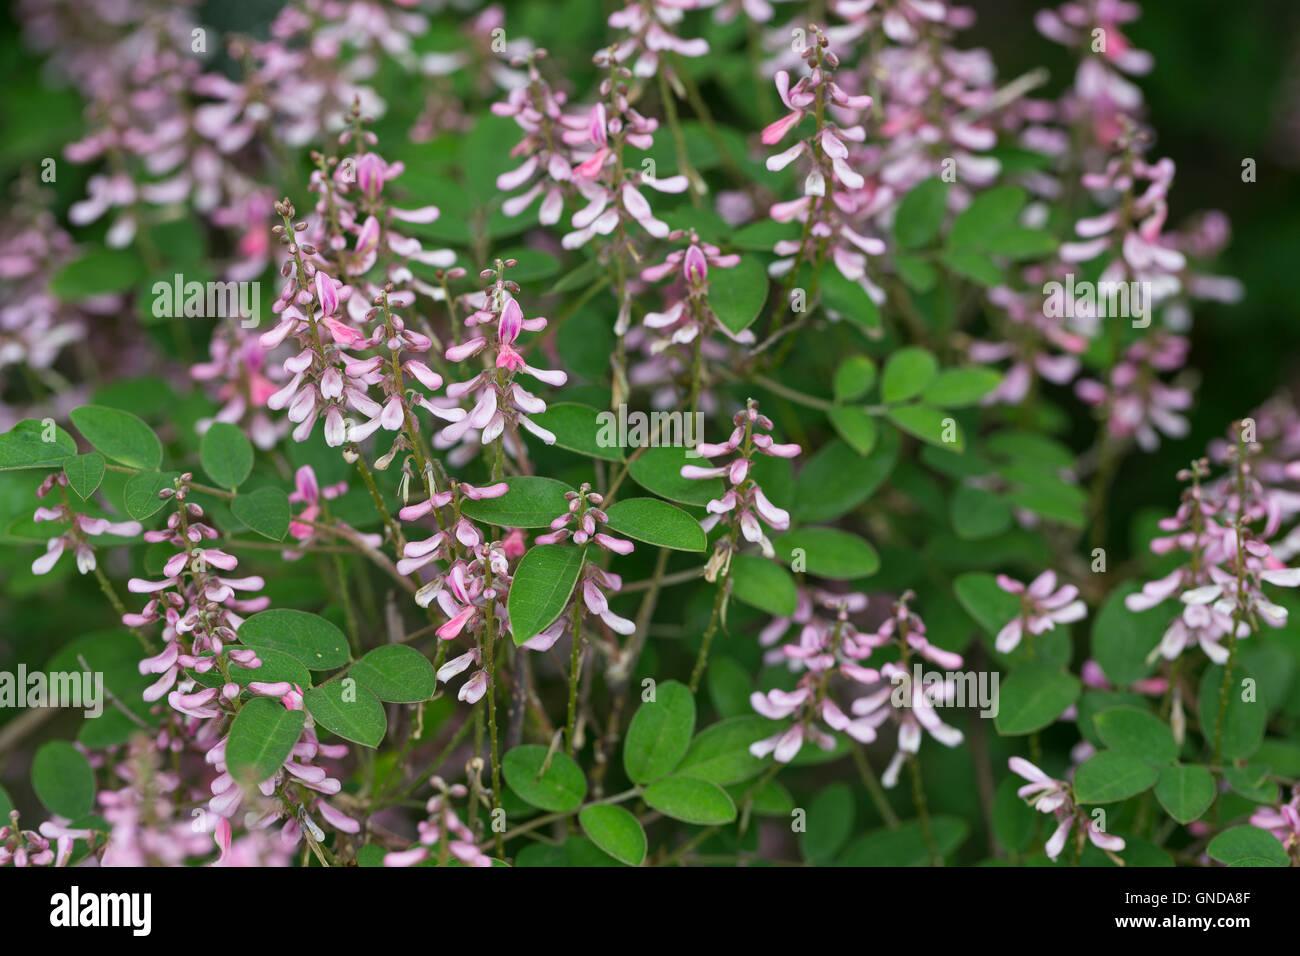 Indigostrauch, Indigo-Strauch, Indigo, Indigofera amblyantha, Pink-flower Indigo, Pink-flowered indigo, Chinese - Stock Image